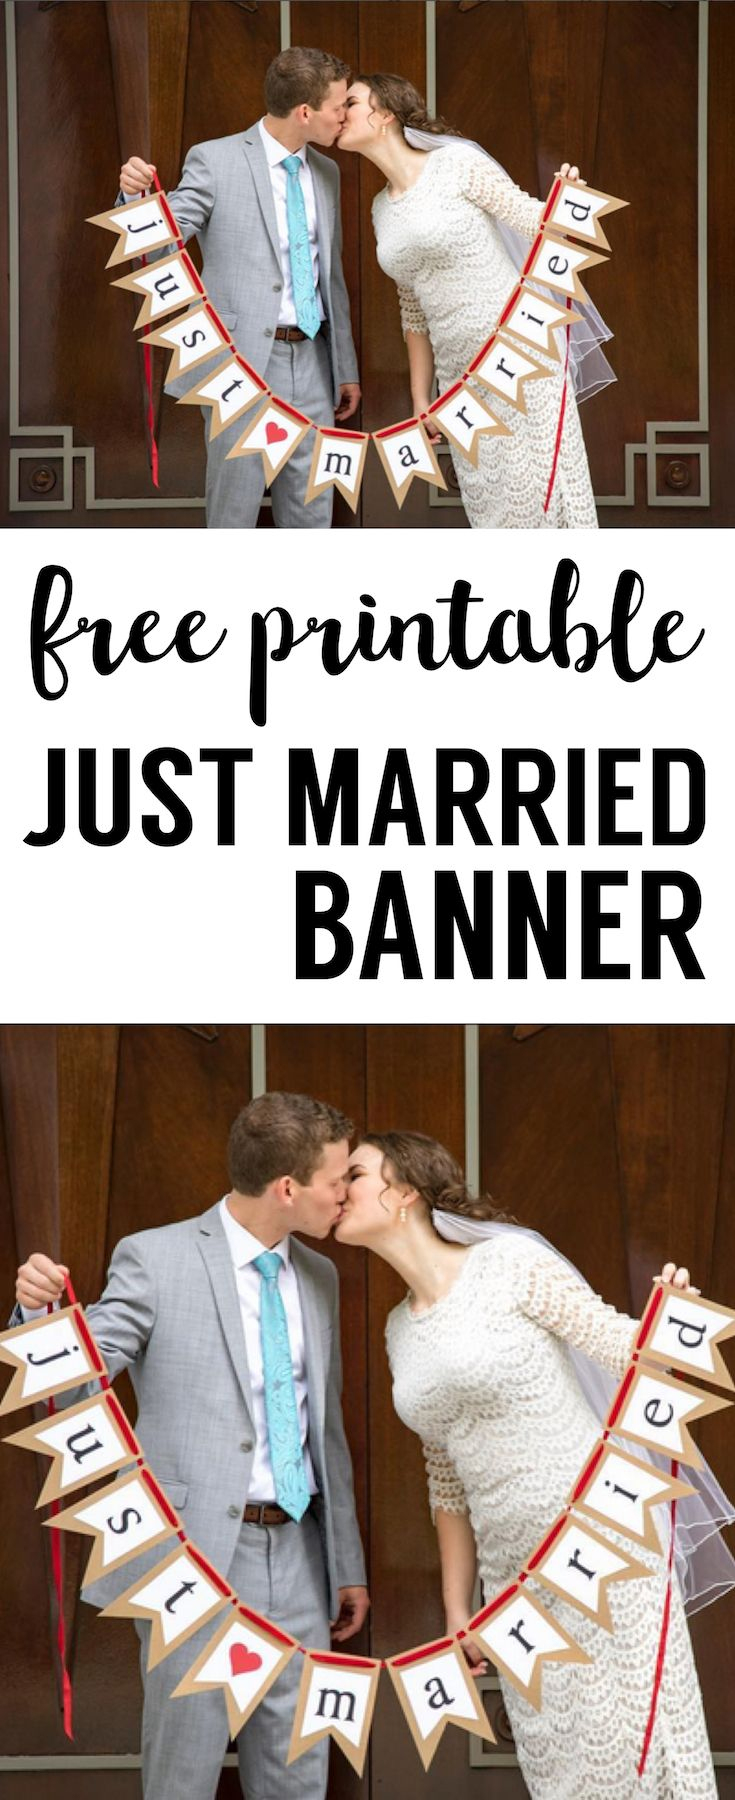 Free Printable Just Married Banner   Wedding Stuff   Casamiento - Just Married Free Printable